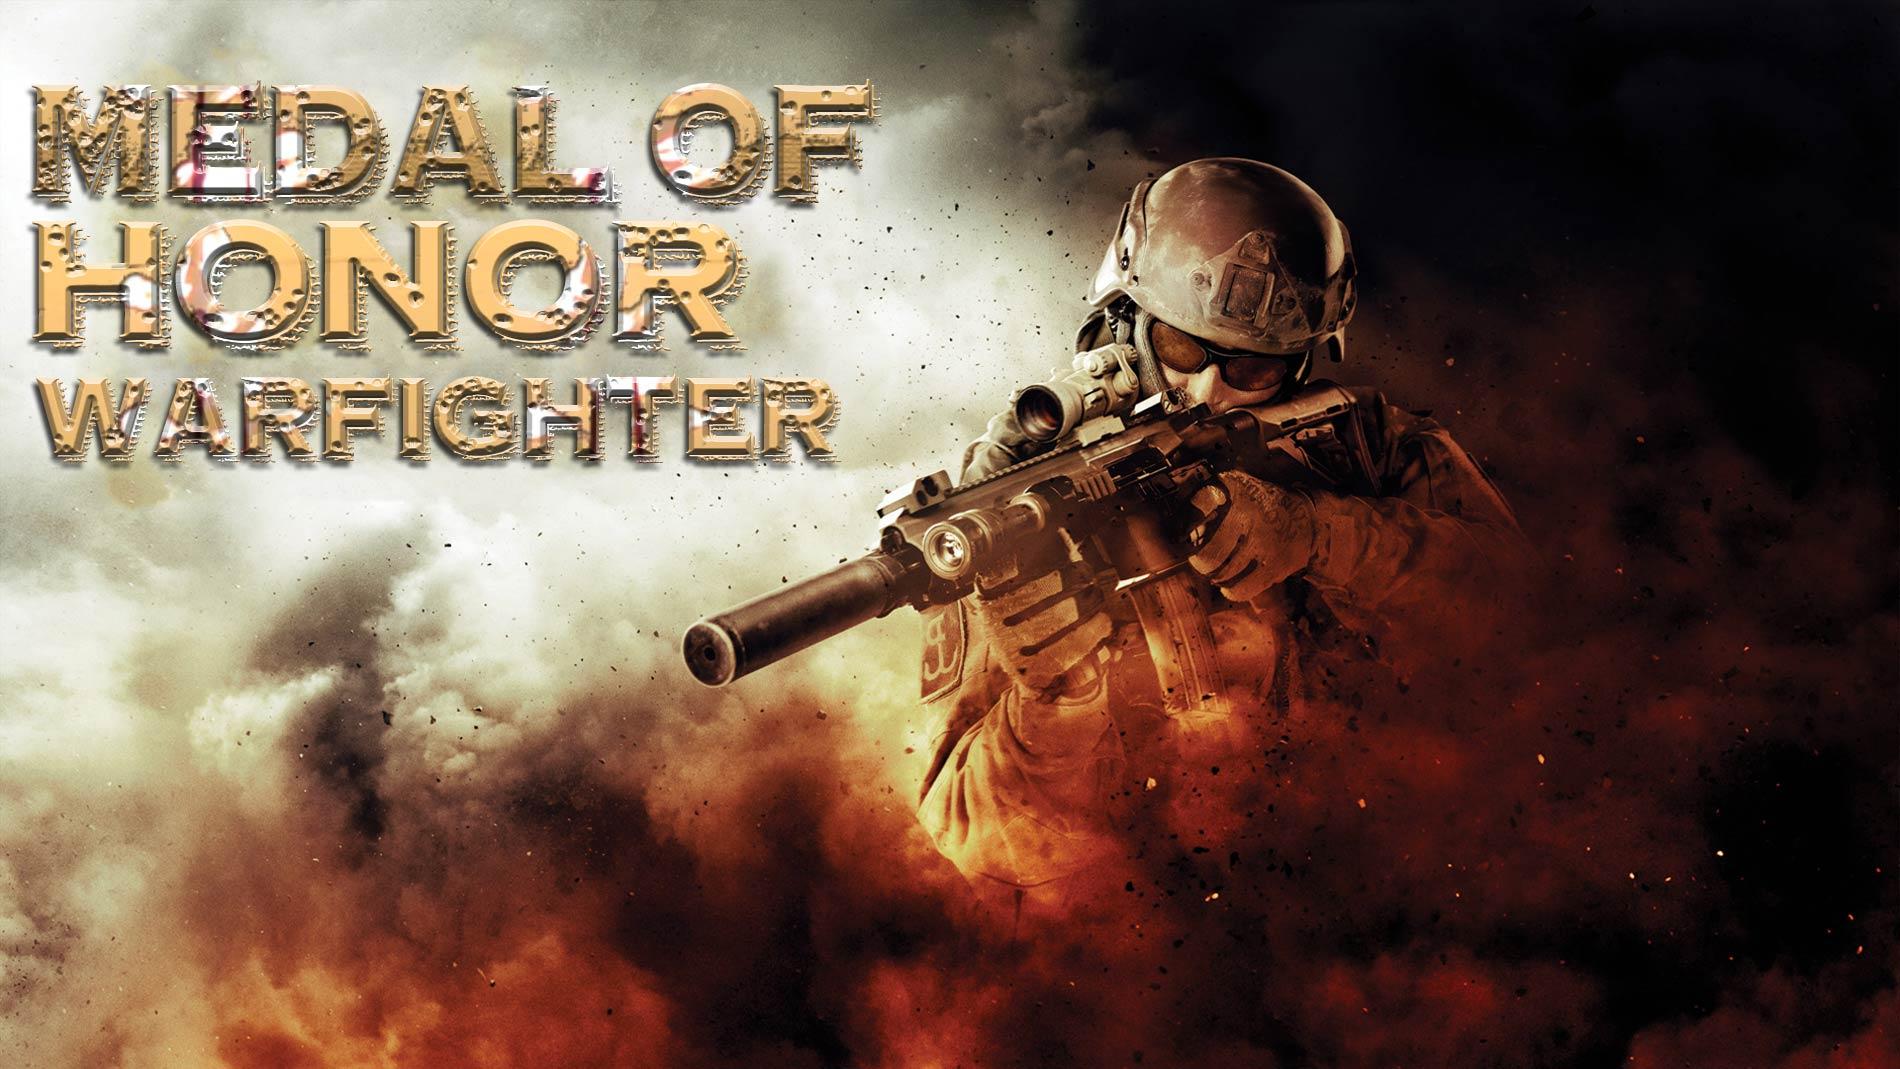 moh warfighter wallpaper hd - photo #23